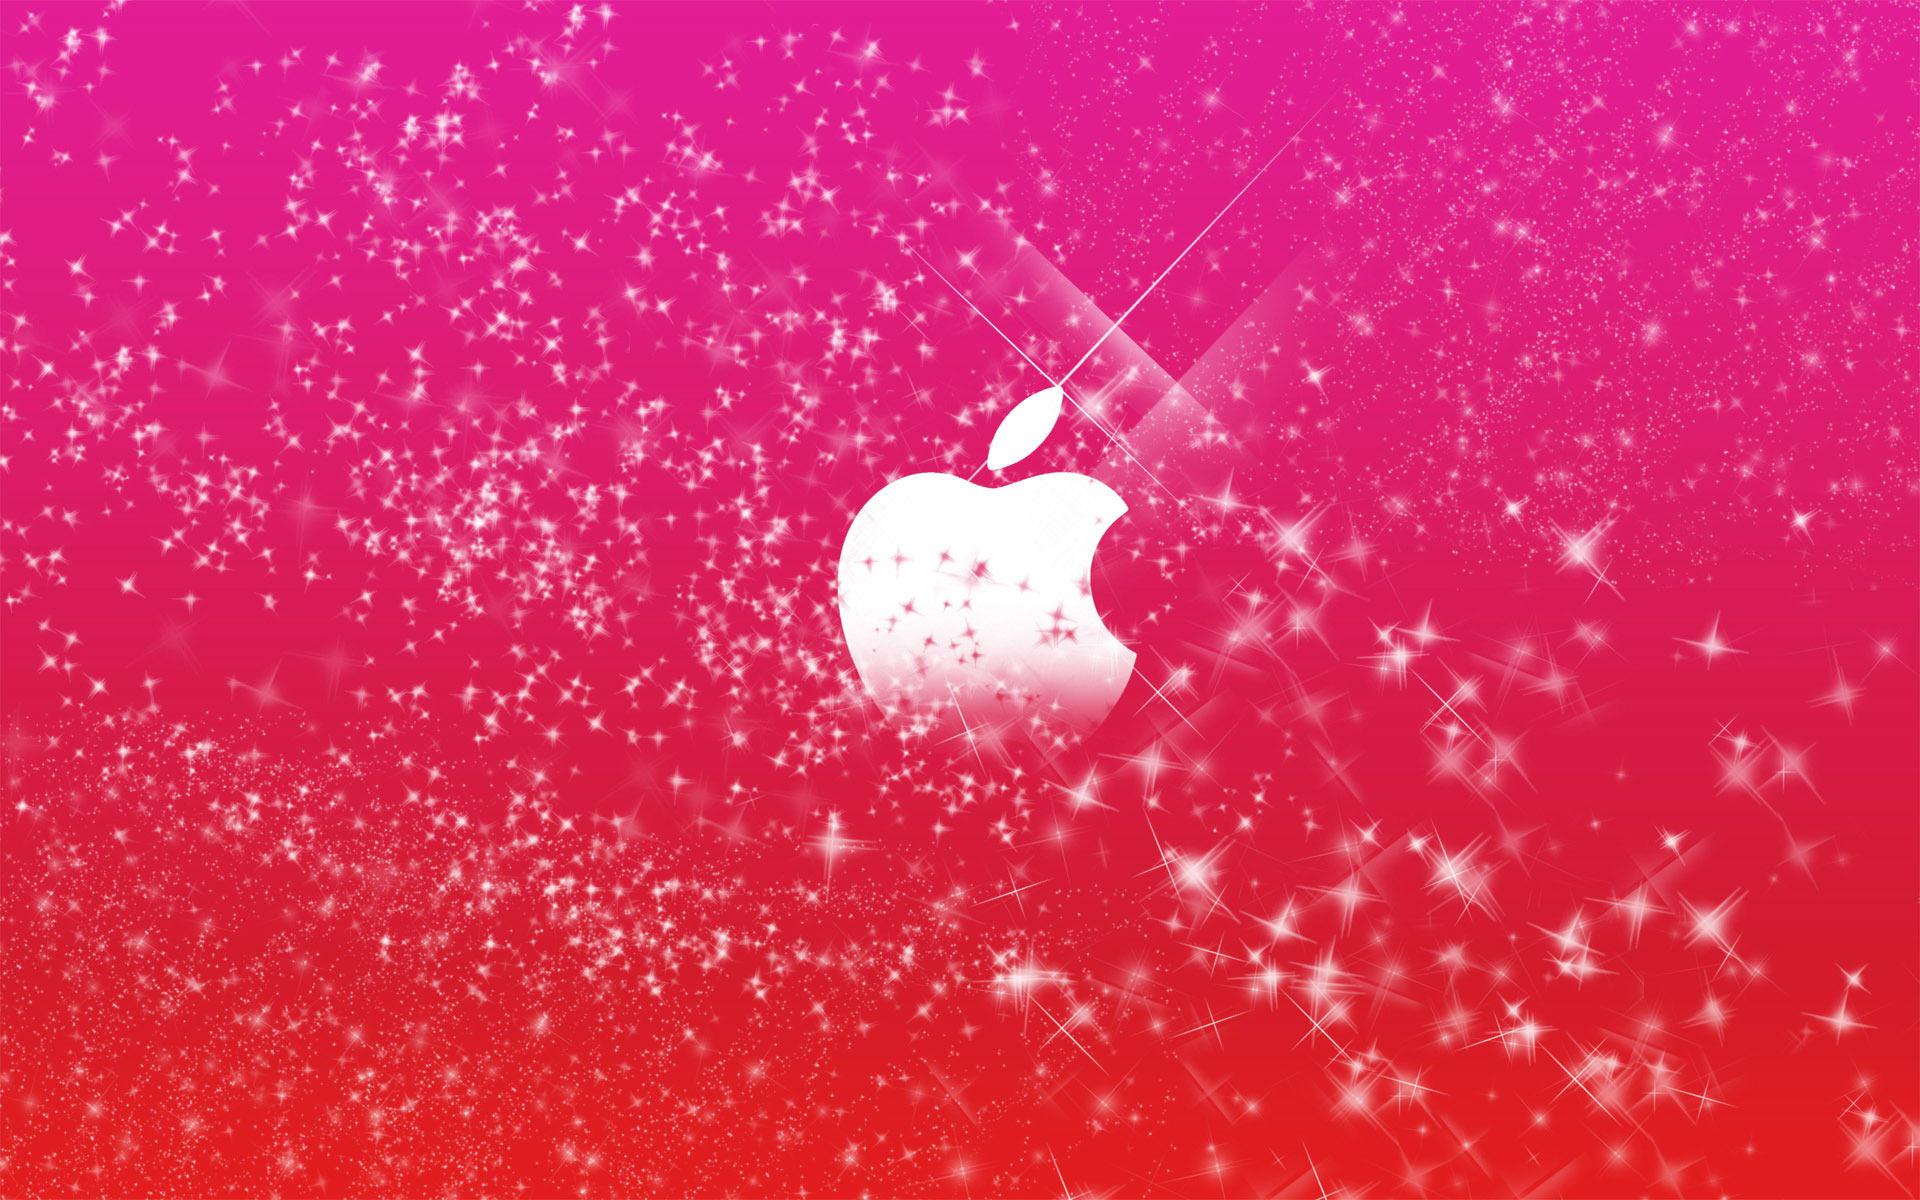 pink desktop backgrounds 3jpg 1920x1200